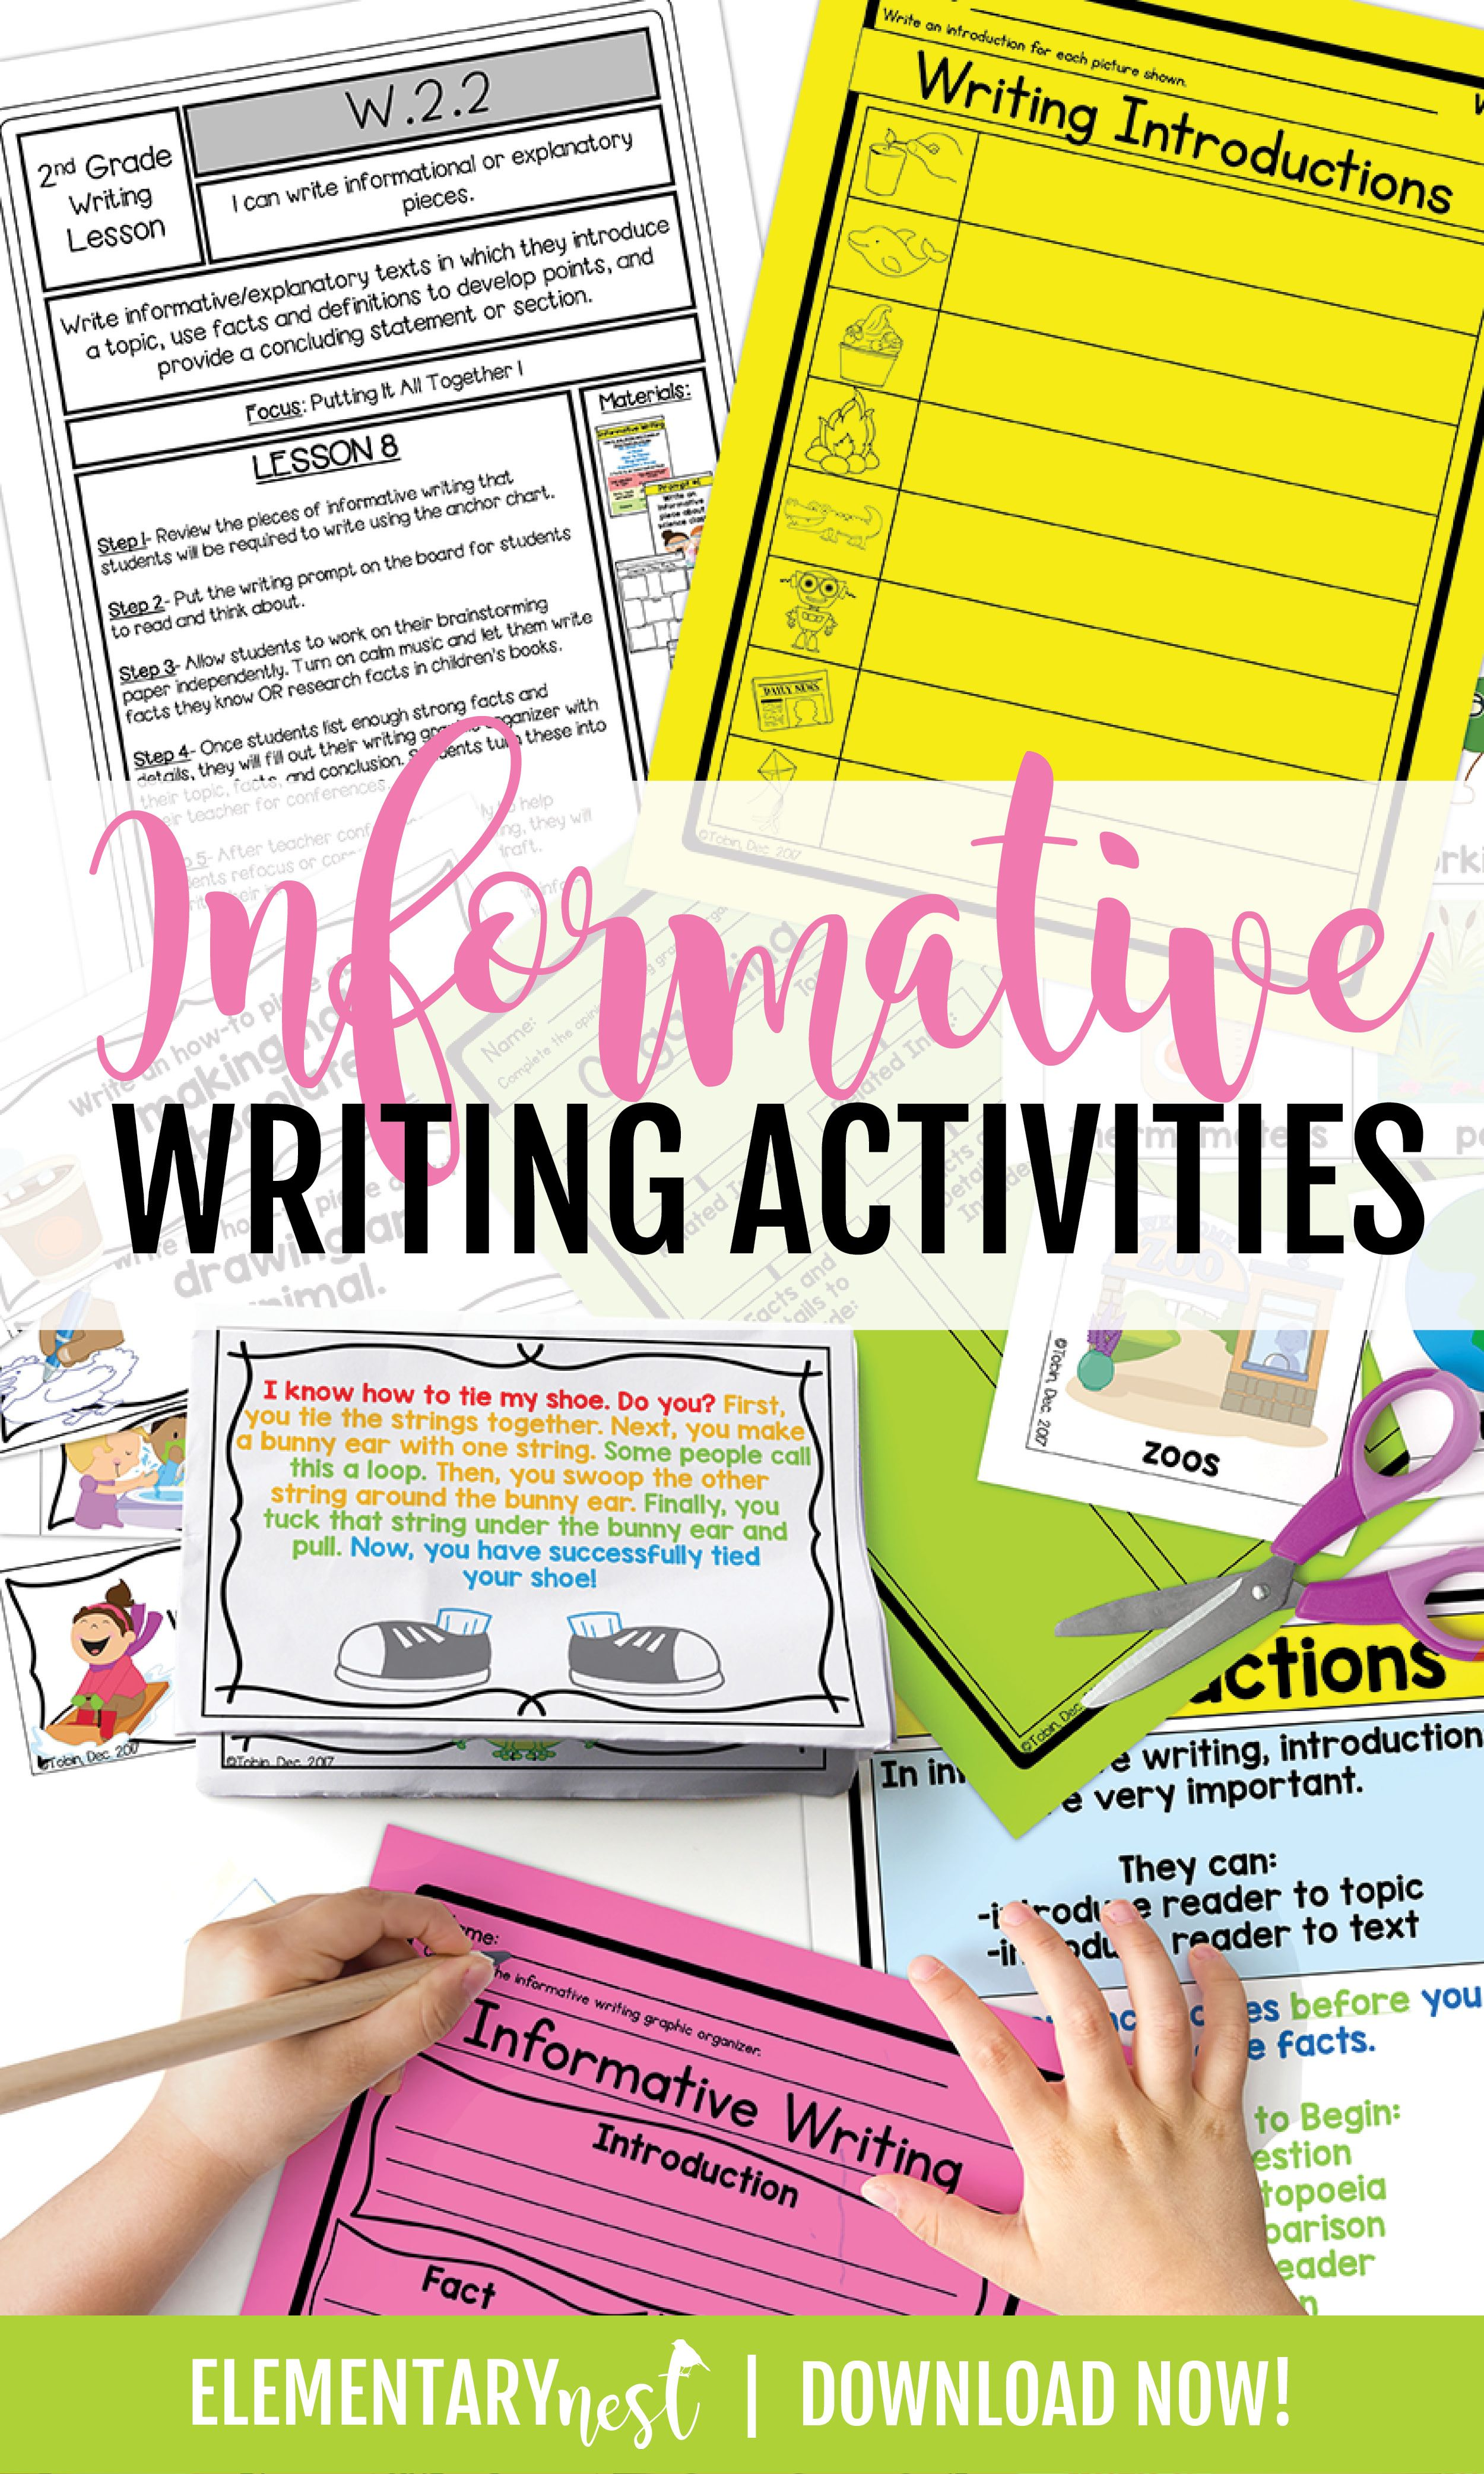 Informative Writing Activitie For 2nd Grade Informational Explanatory Lesson Plans Brainpop Paraphrasing